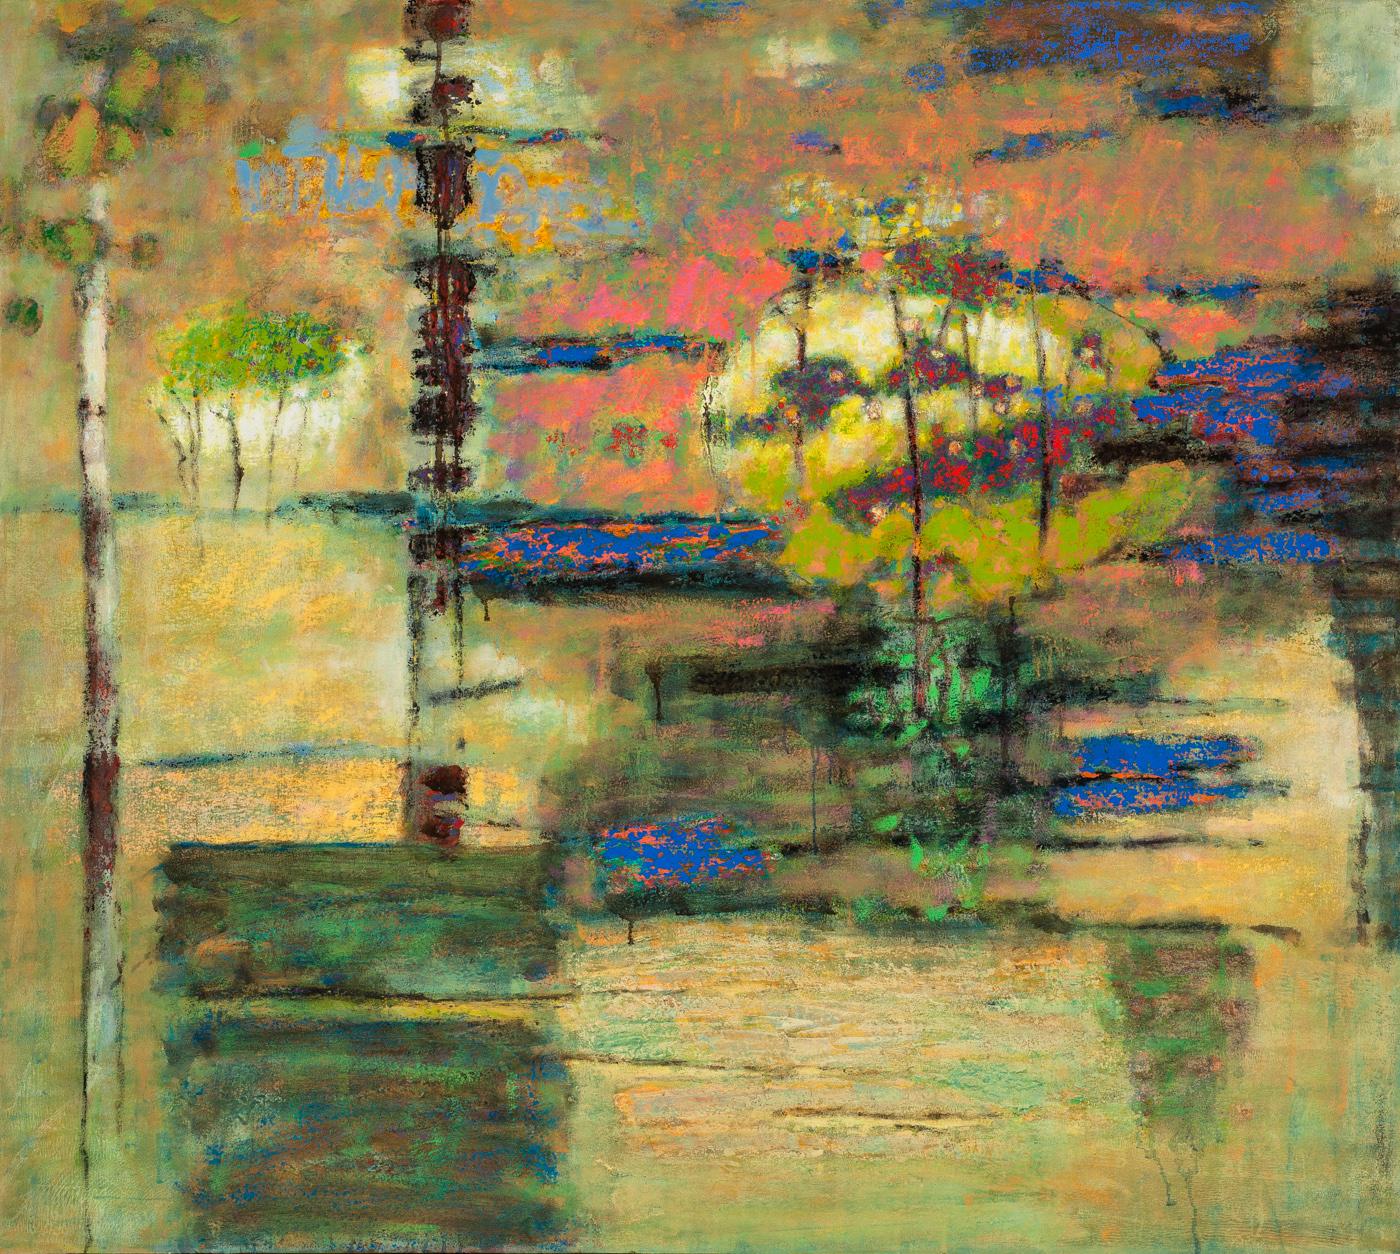 "Toward the Unknown Region     oil on canvas   48 x 54""   2015"